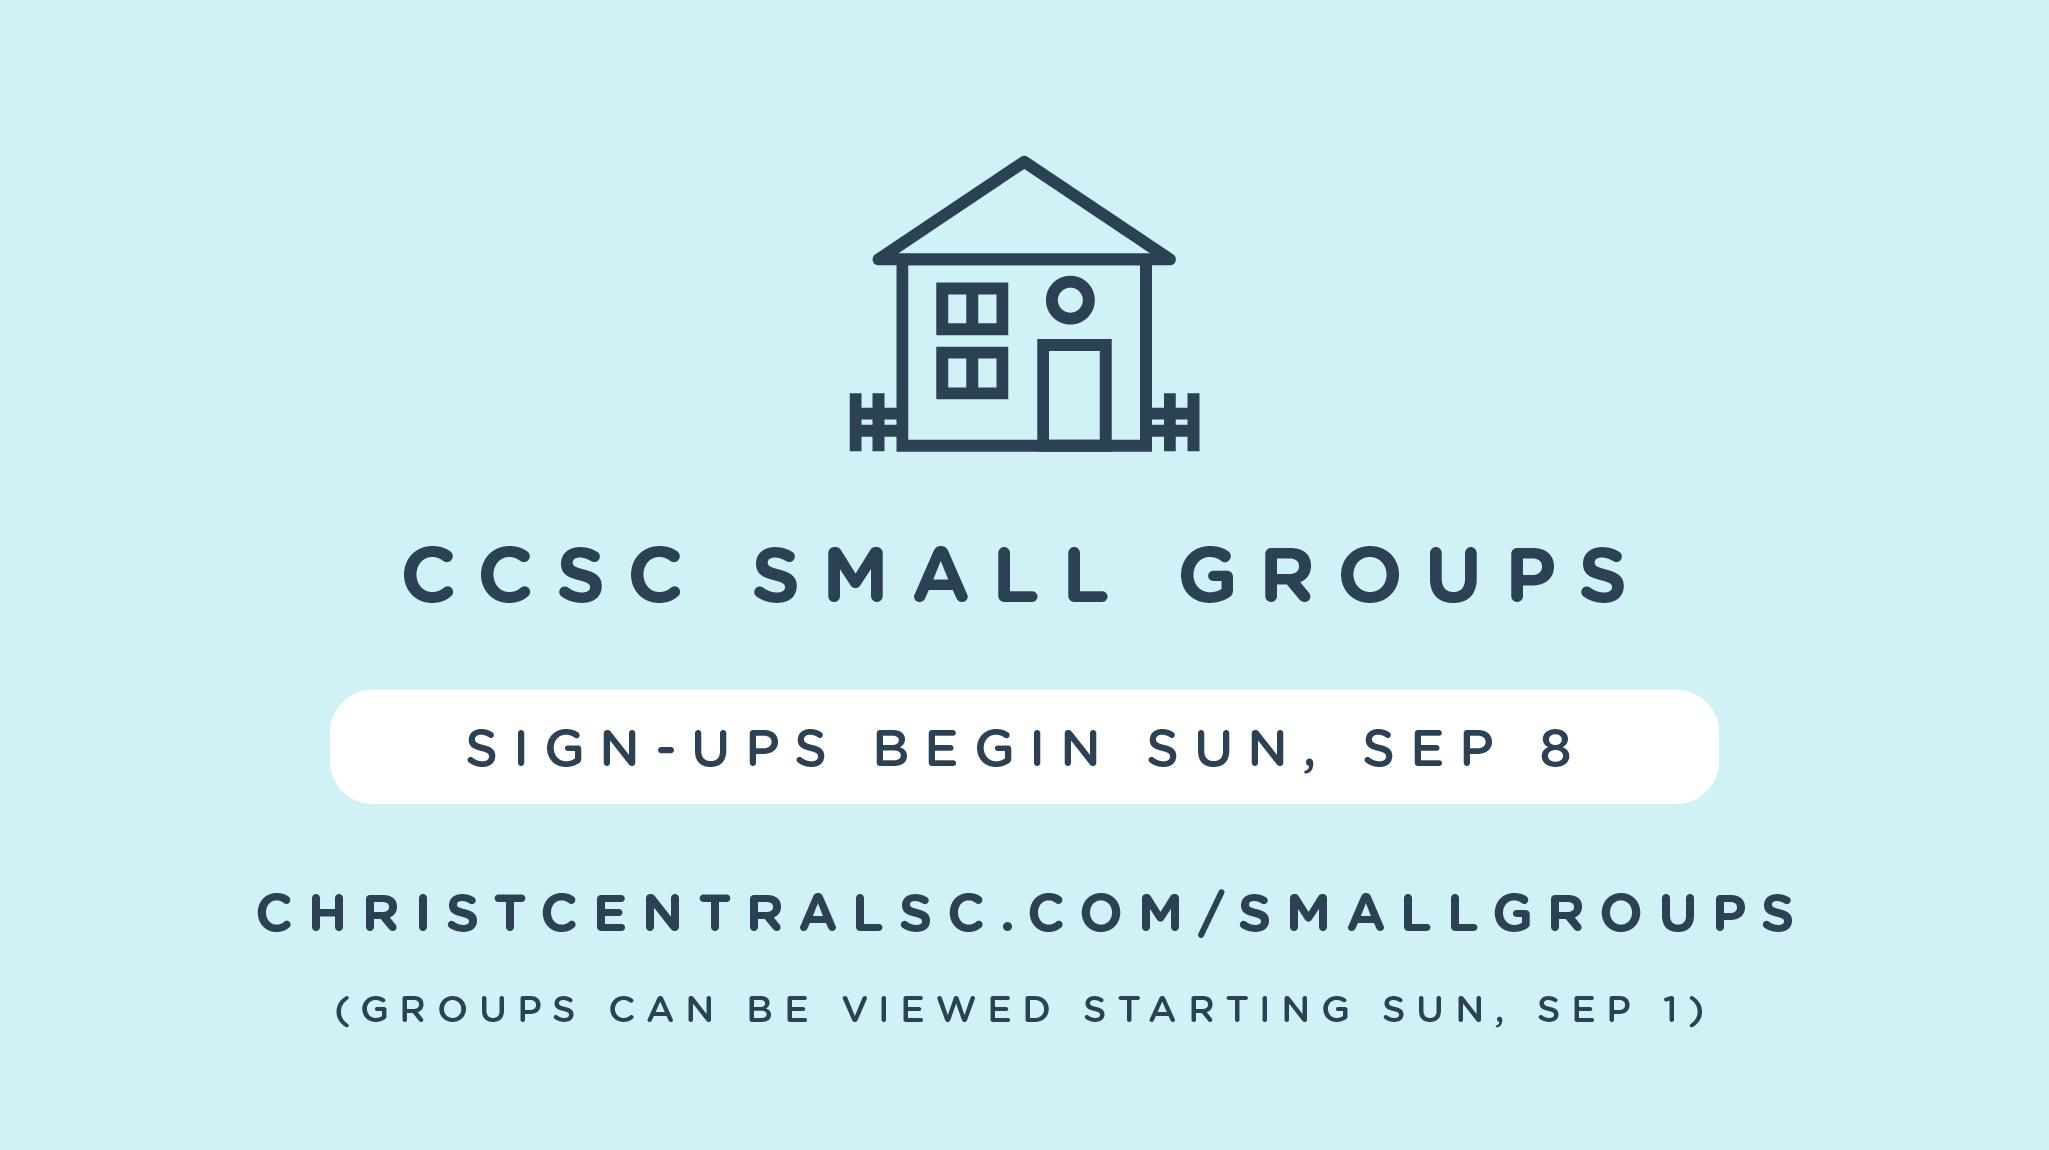 smallgroupreg-2019-02.png